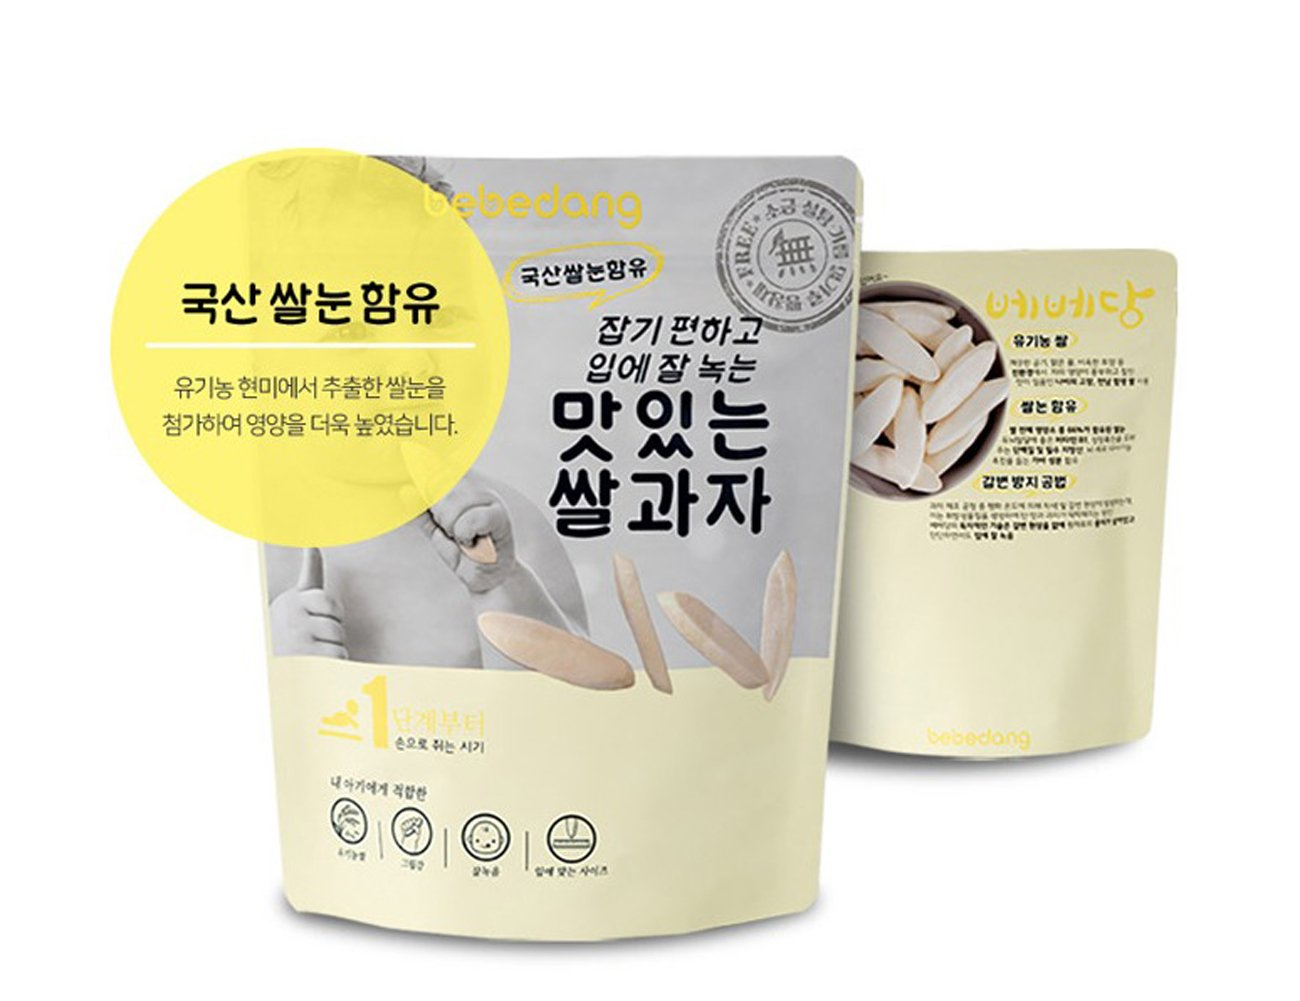 Bebedang Korean Organic Rice Cookies, 30g, pack of 6